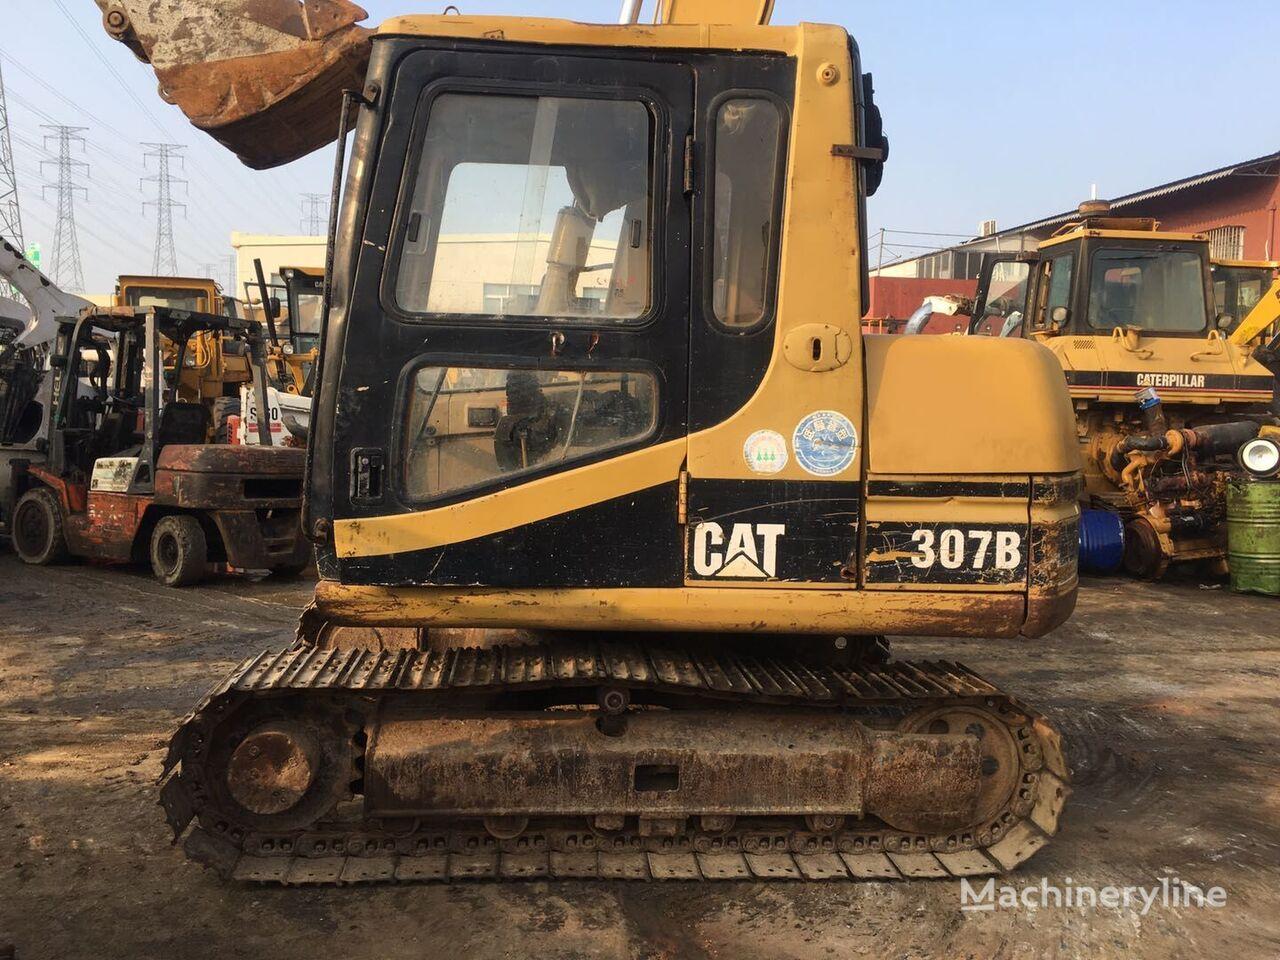 CATERPILLAR 307B tracked excavator